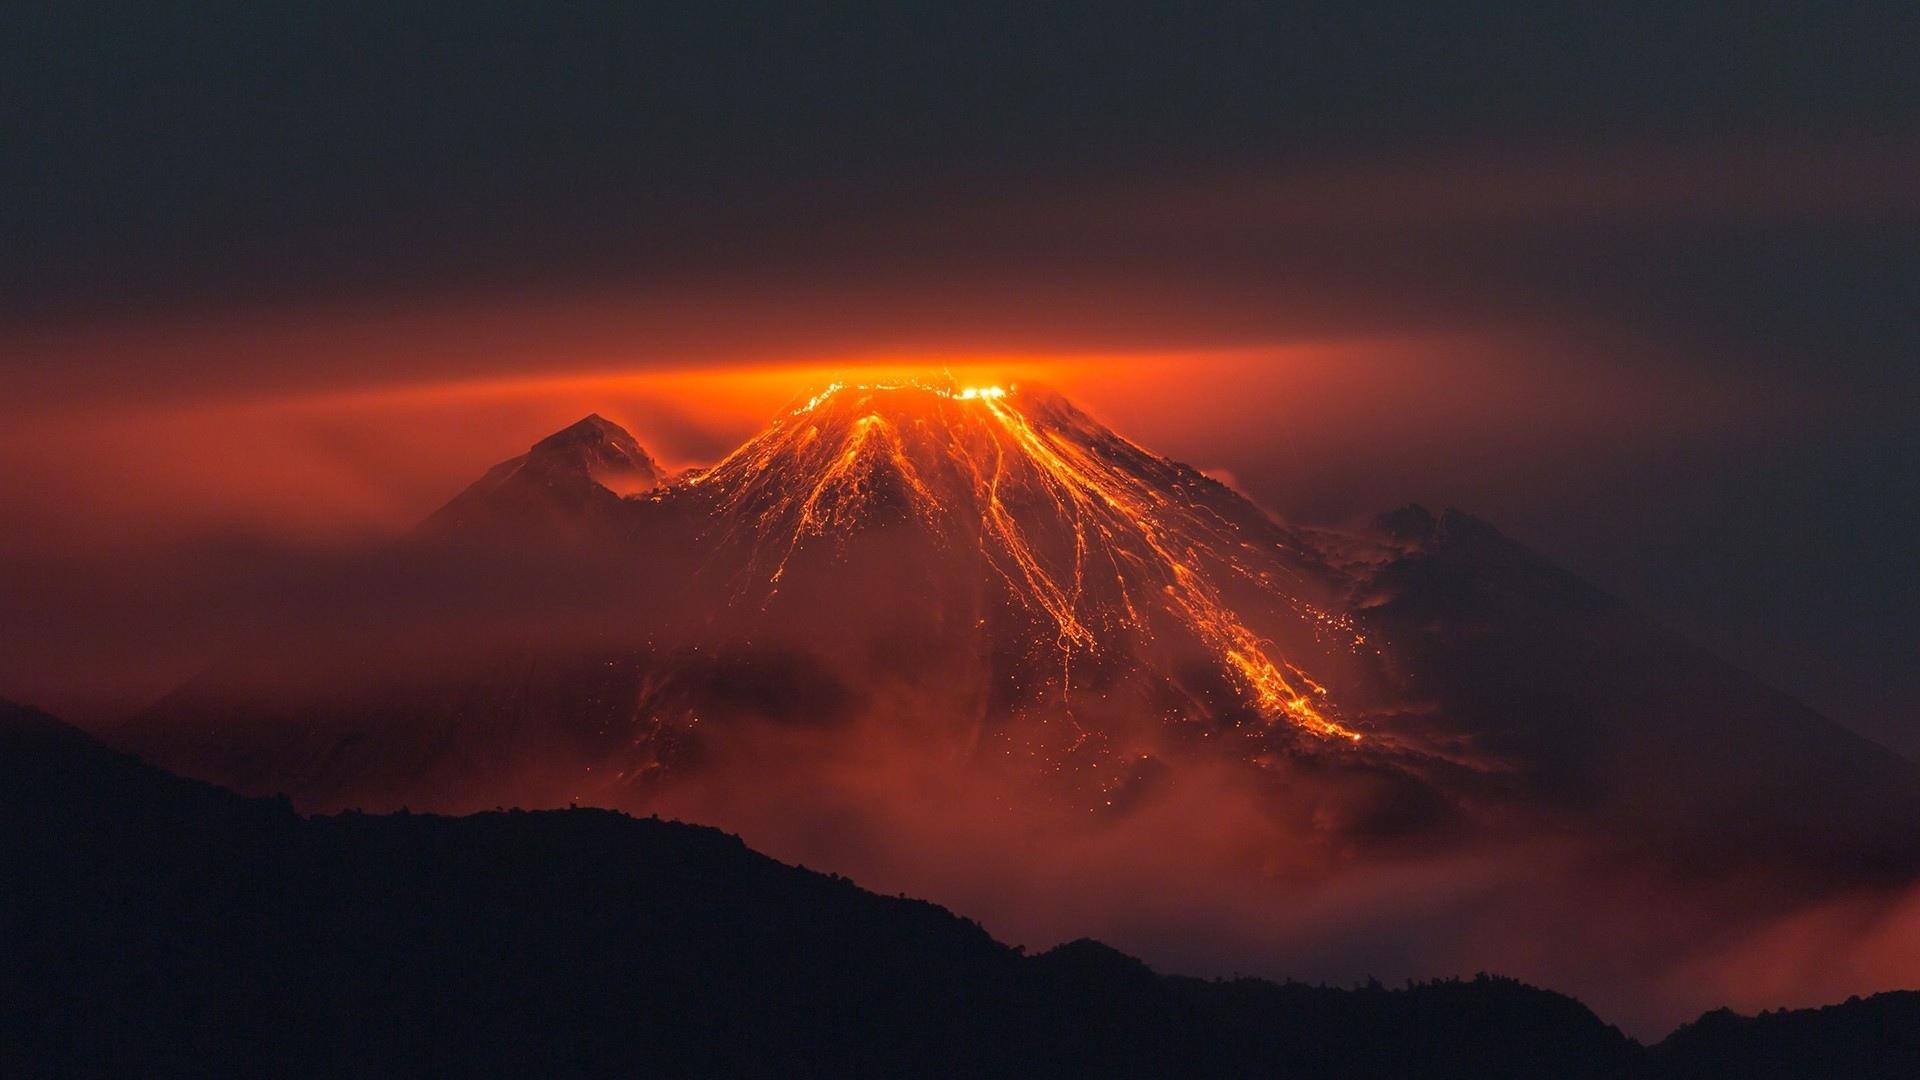 1920x1080 Earth Volcano